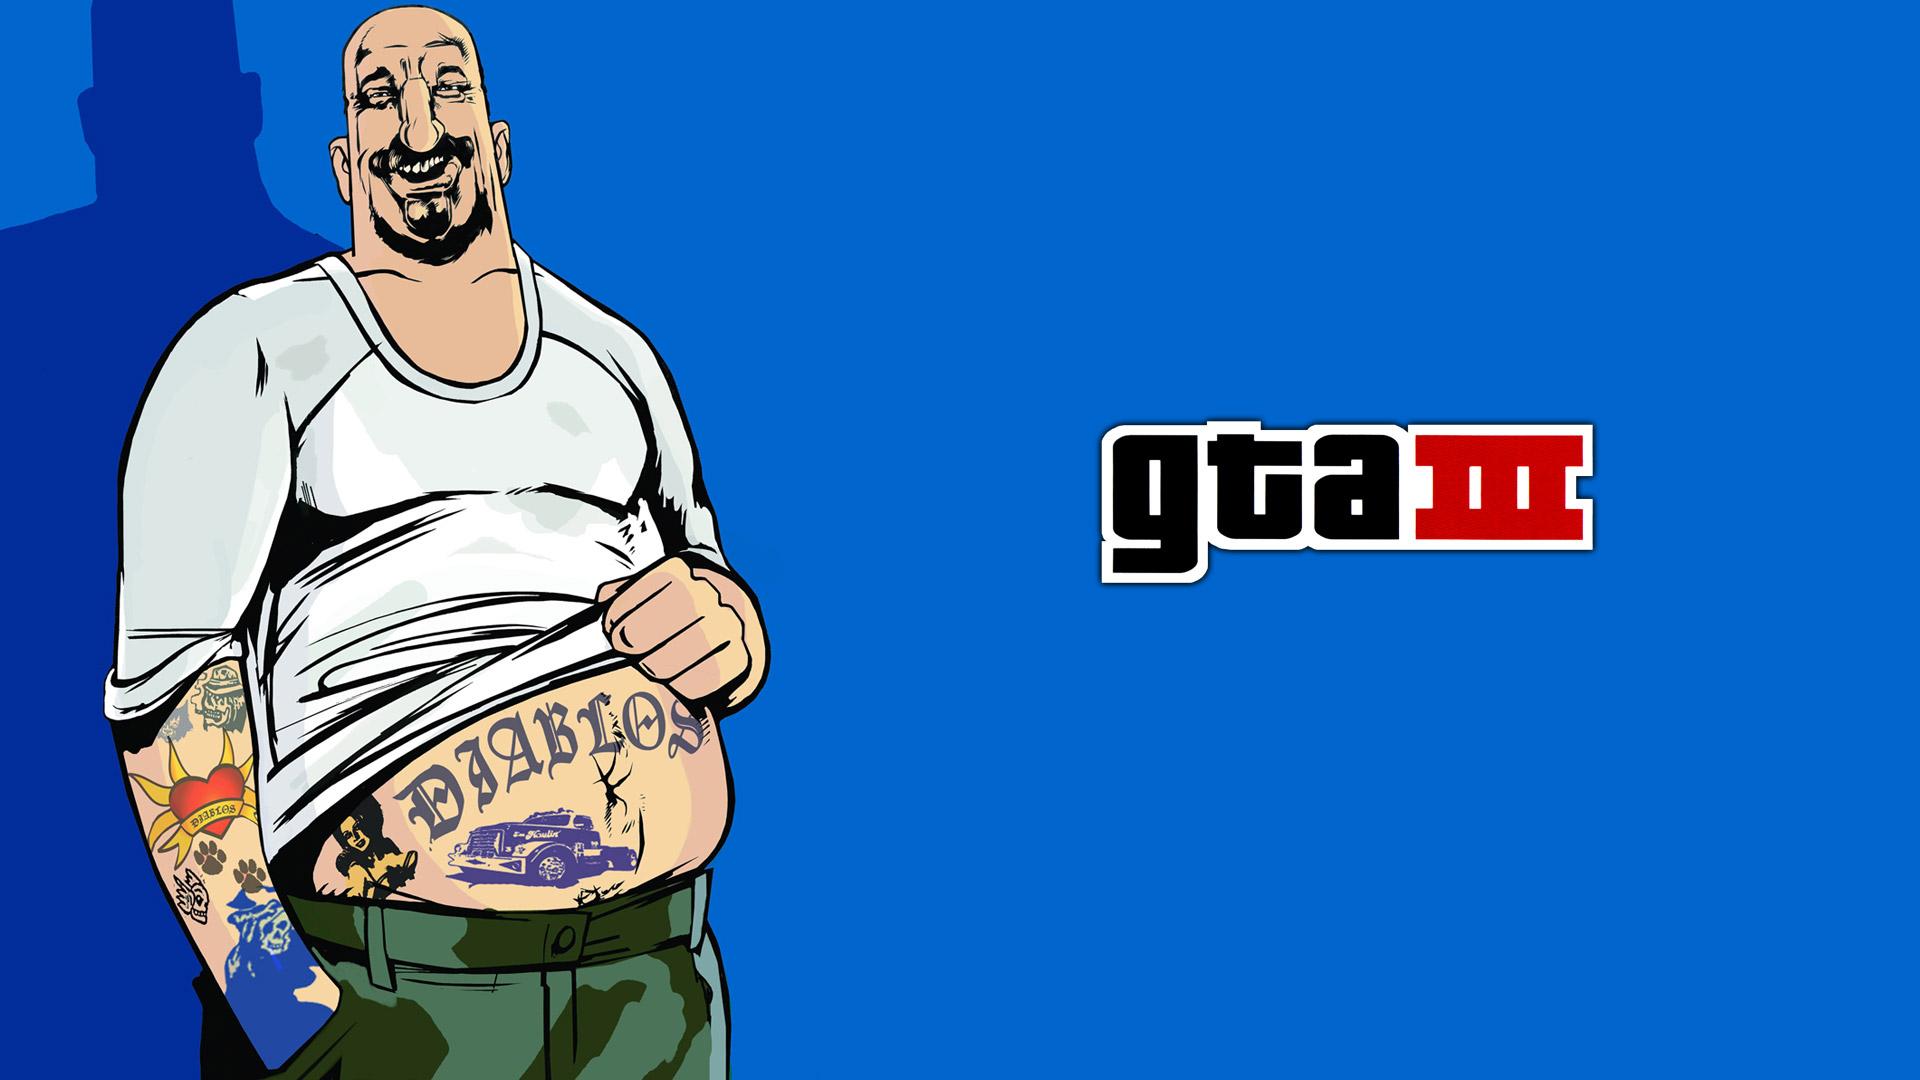 Grand Theft Auto III Wallpaper in 1920x1080